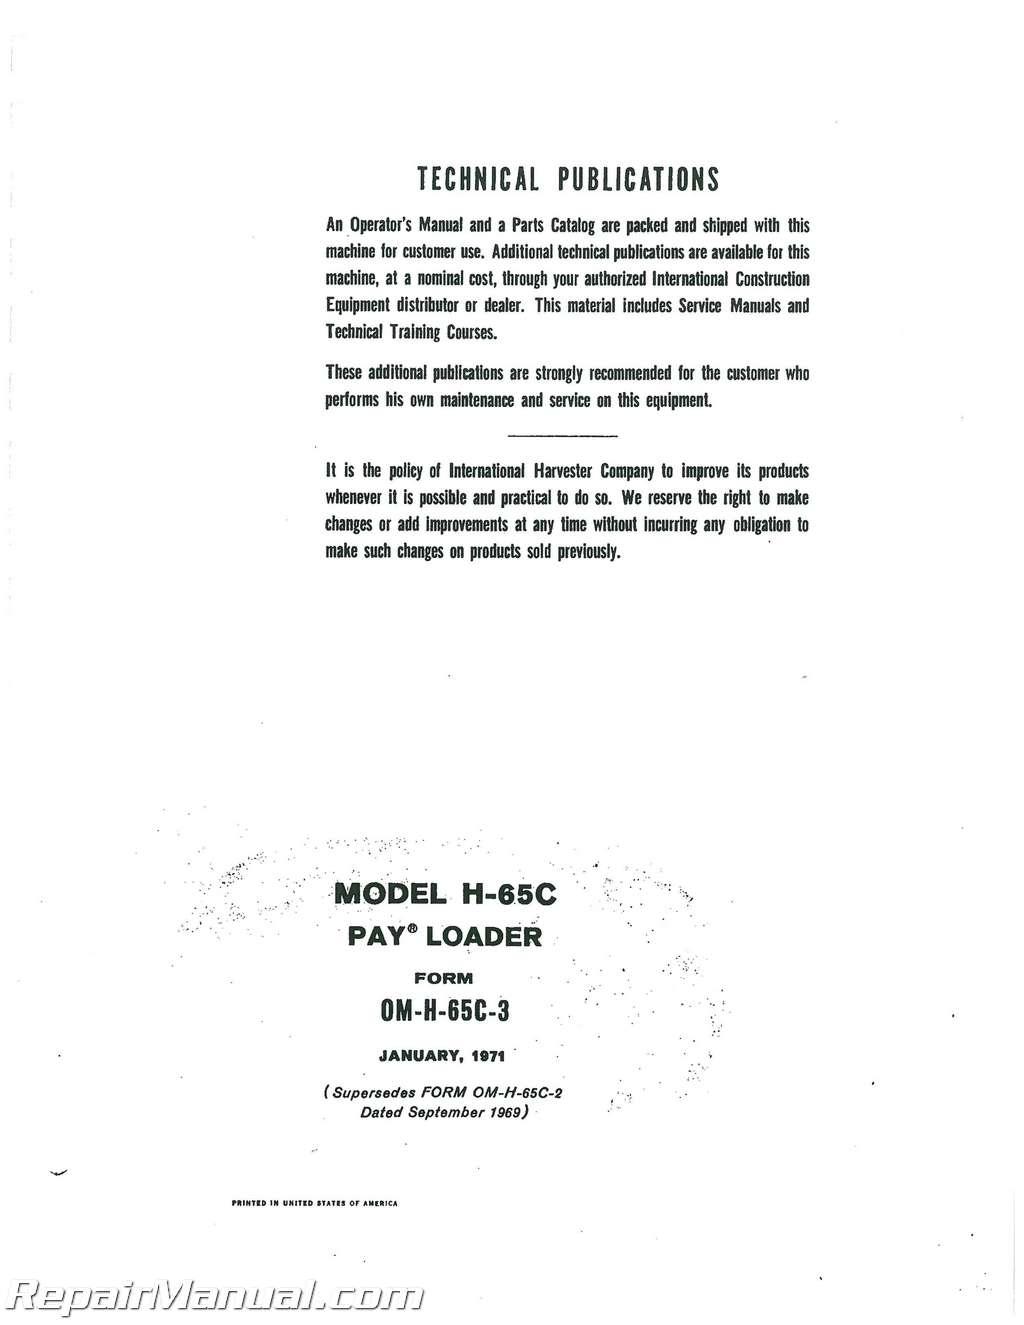 Hough-H-65C-Dsl-Pay-Loader-Operators-Manual_001.